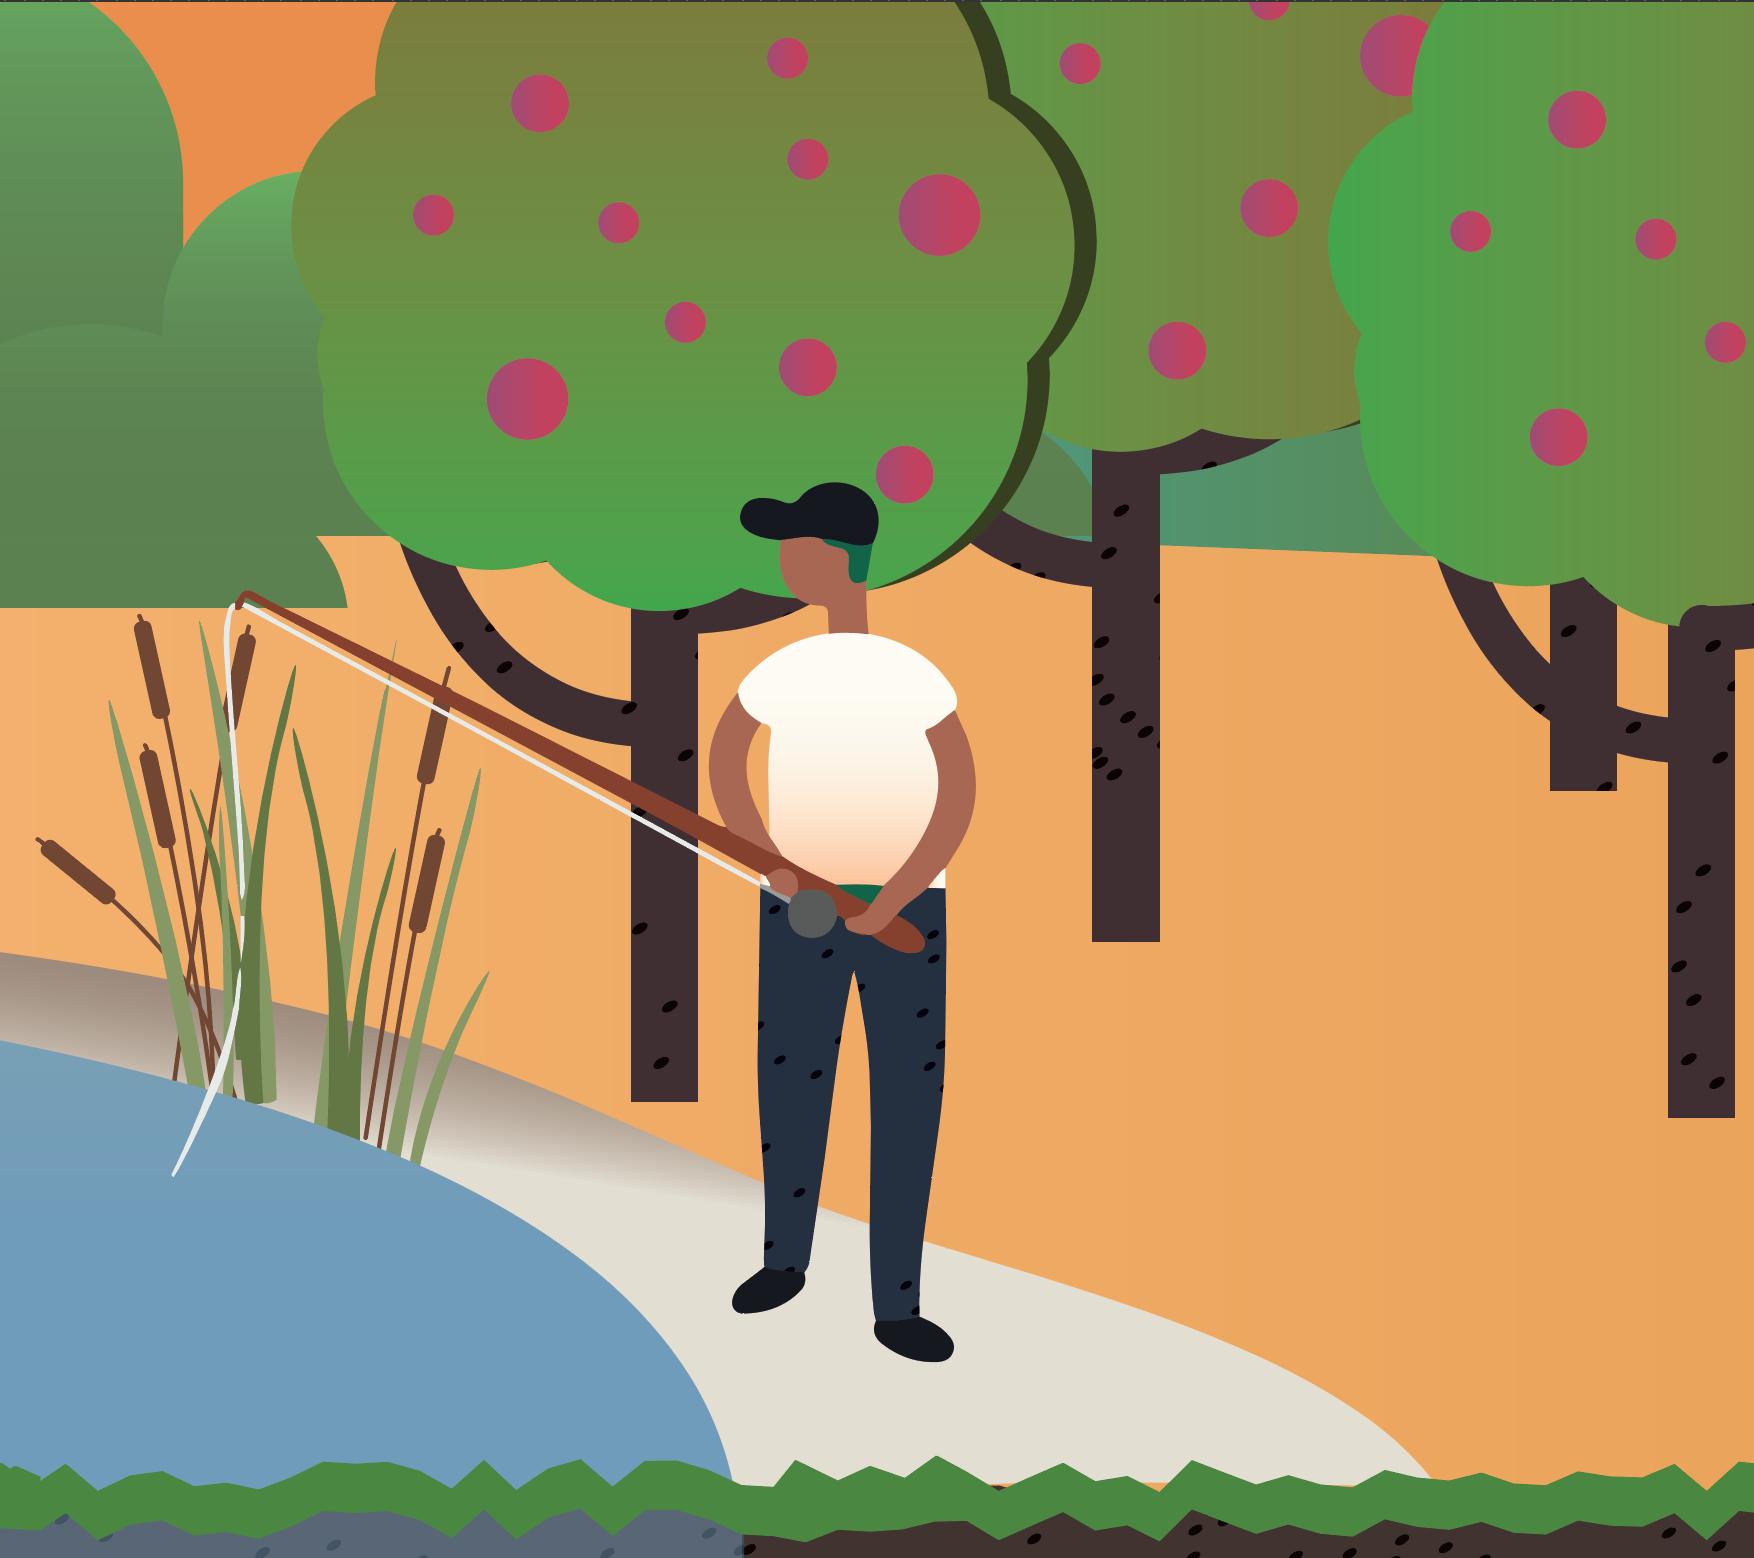 California Groundwater Illustration